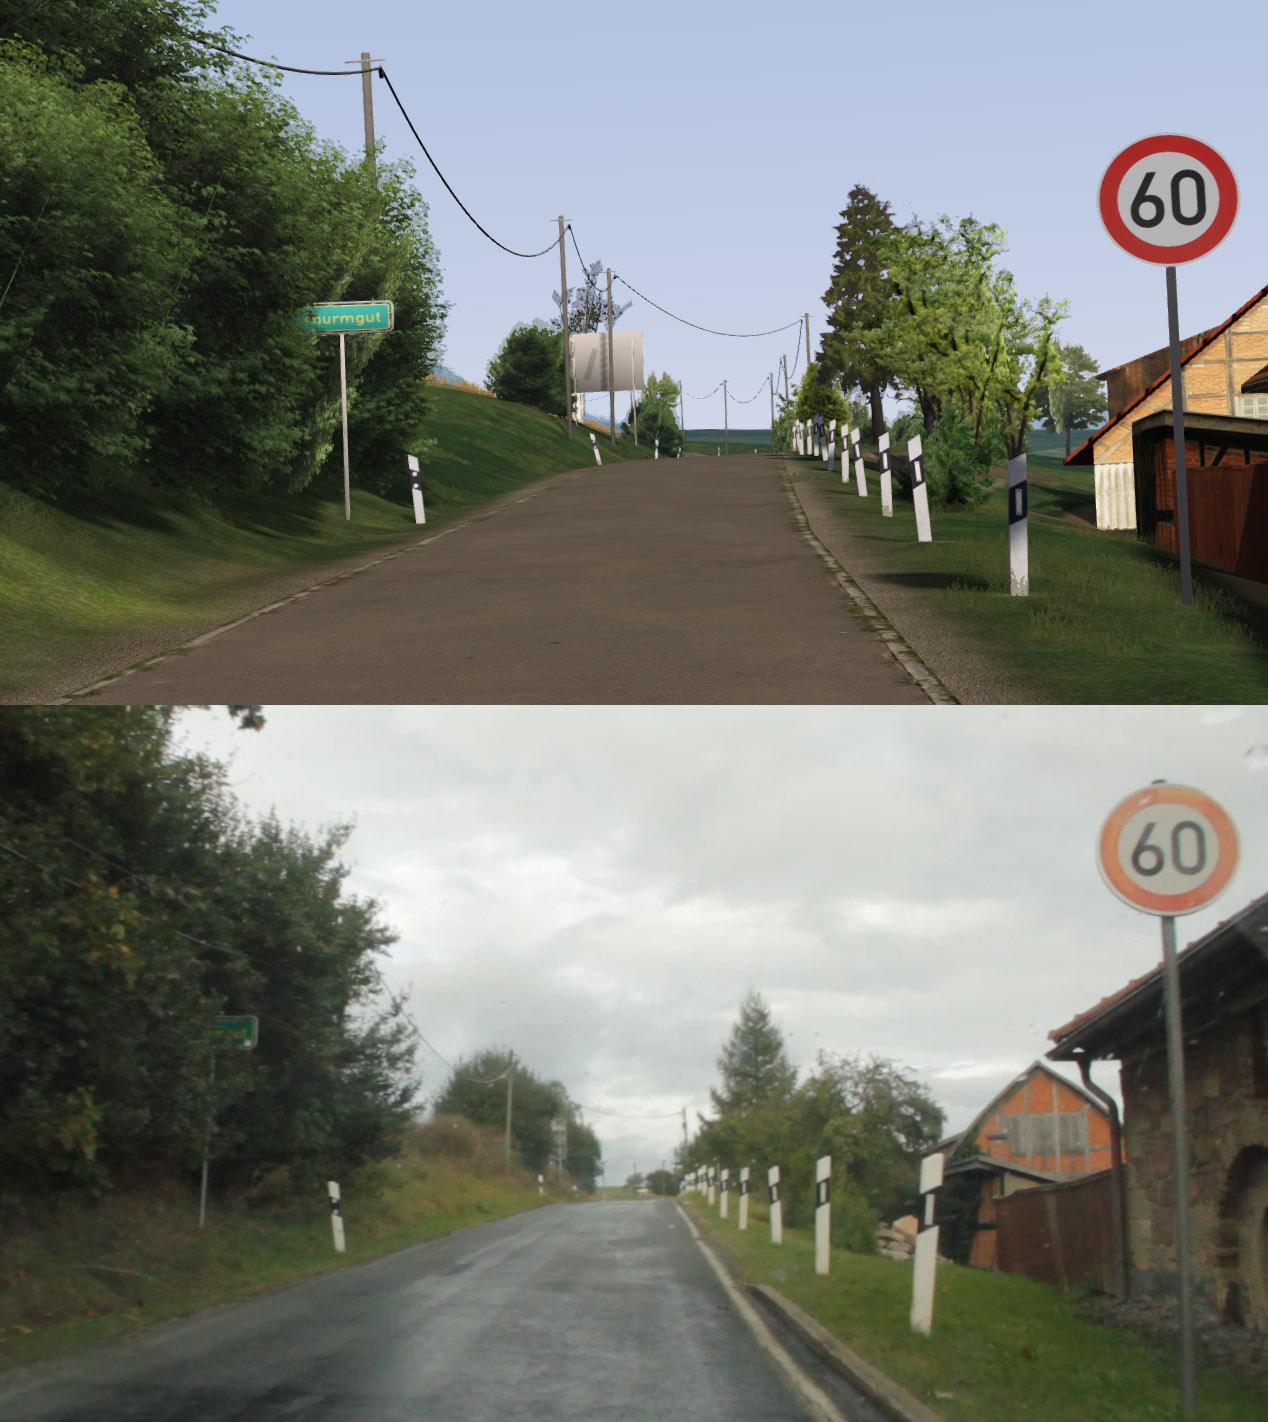 landsberg02_poles.jpg